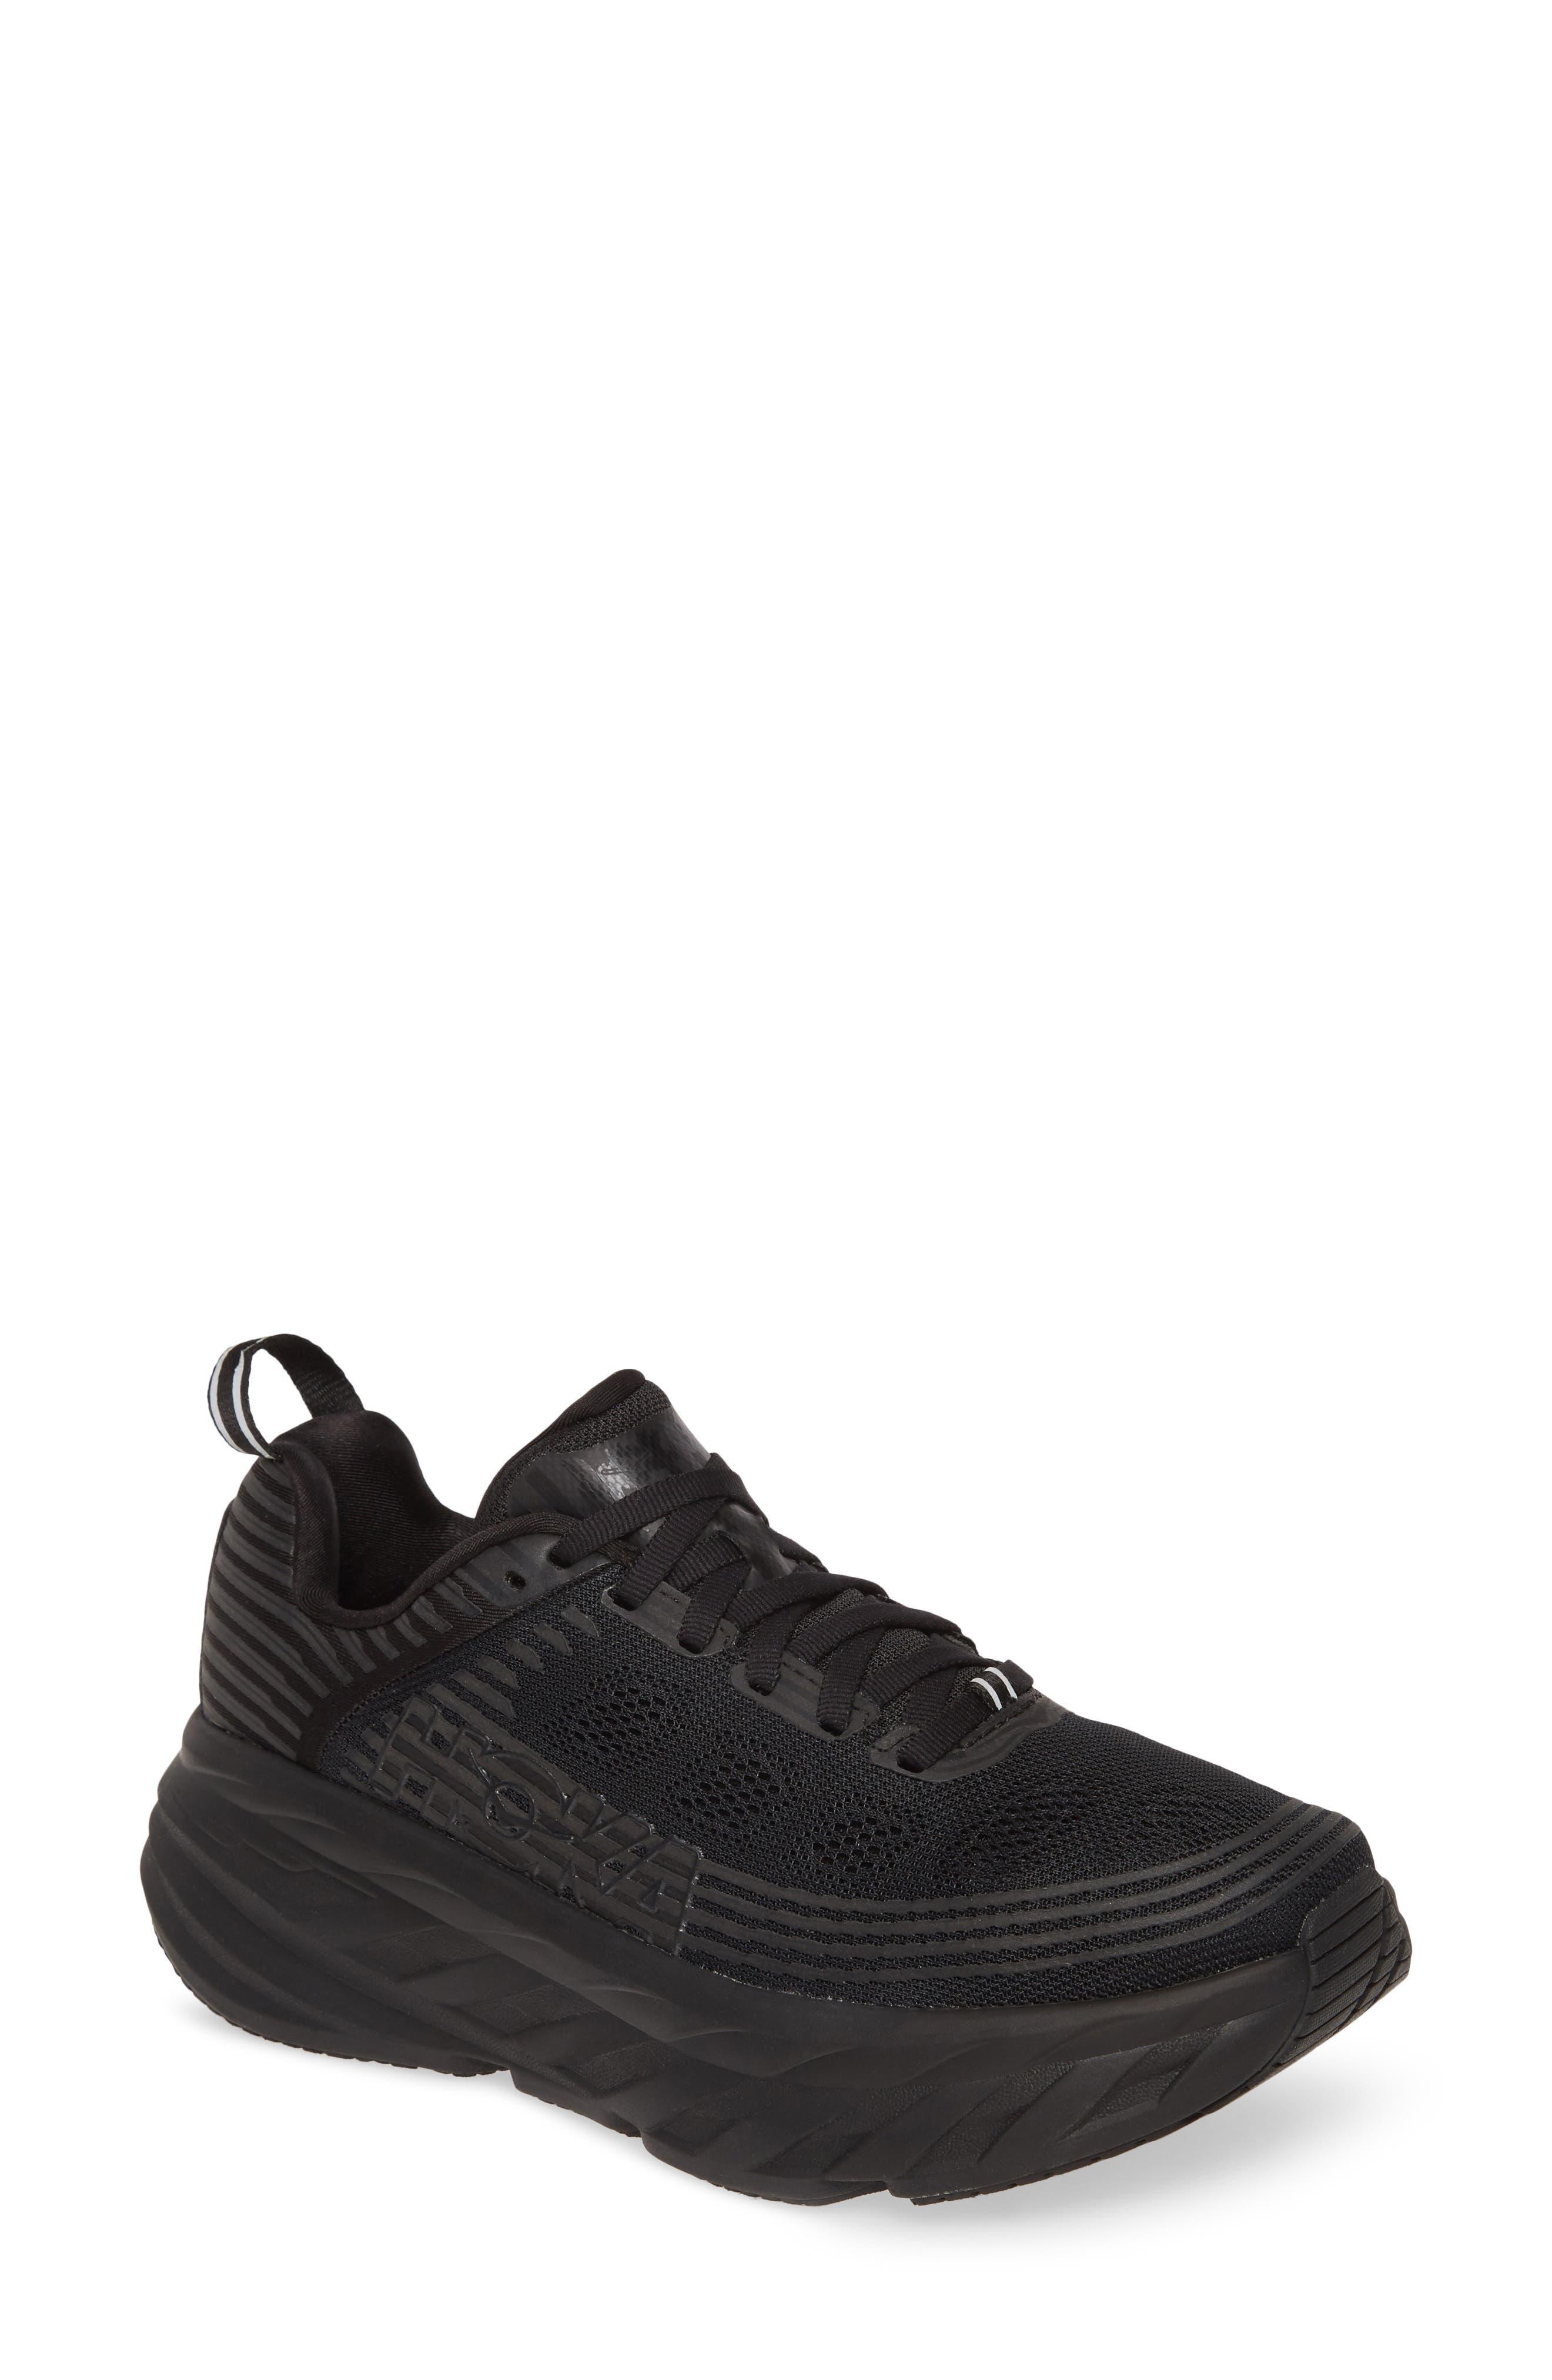 Hoka One One Bondi 6 Running Shoe- Black